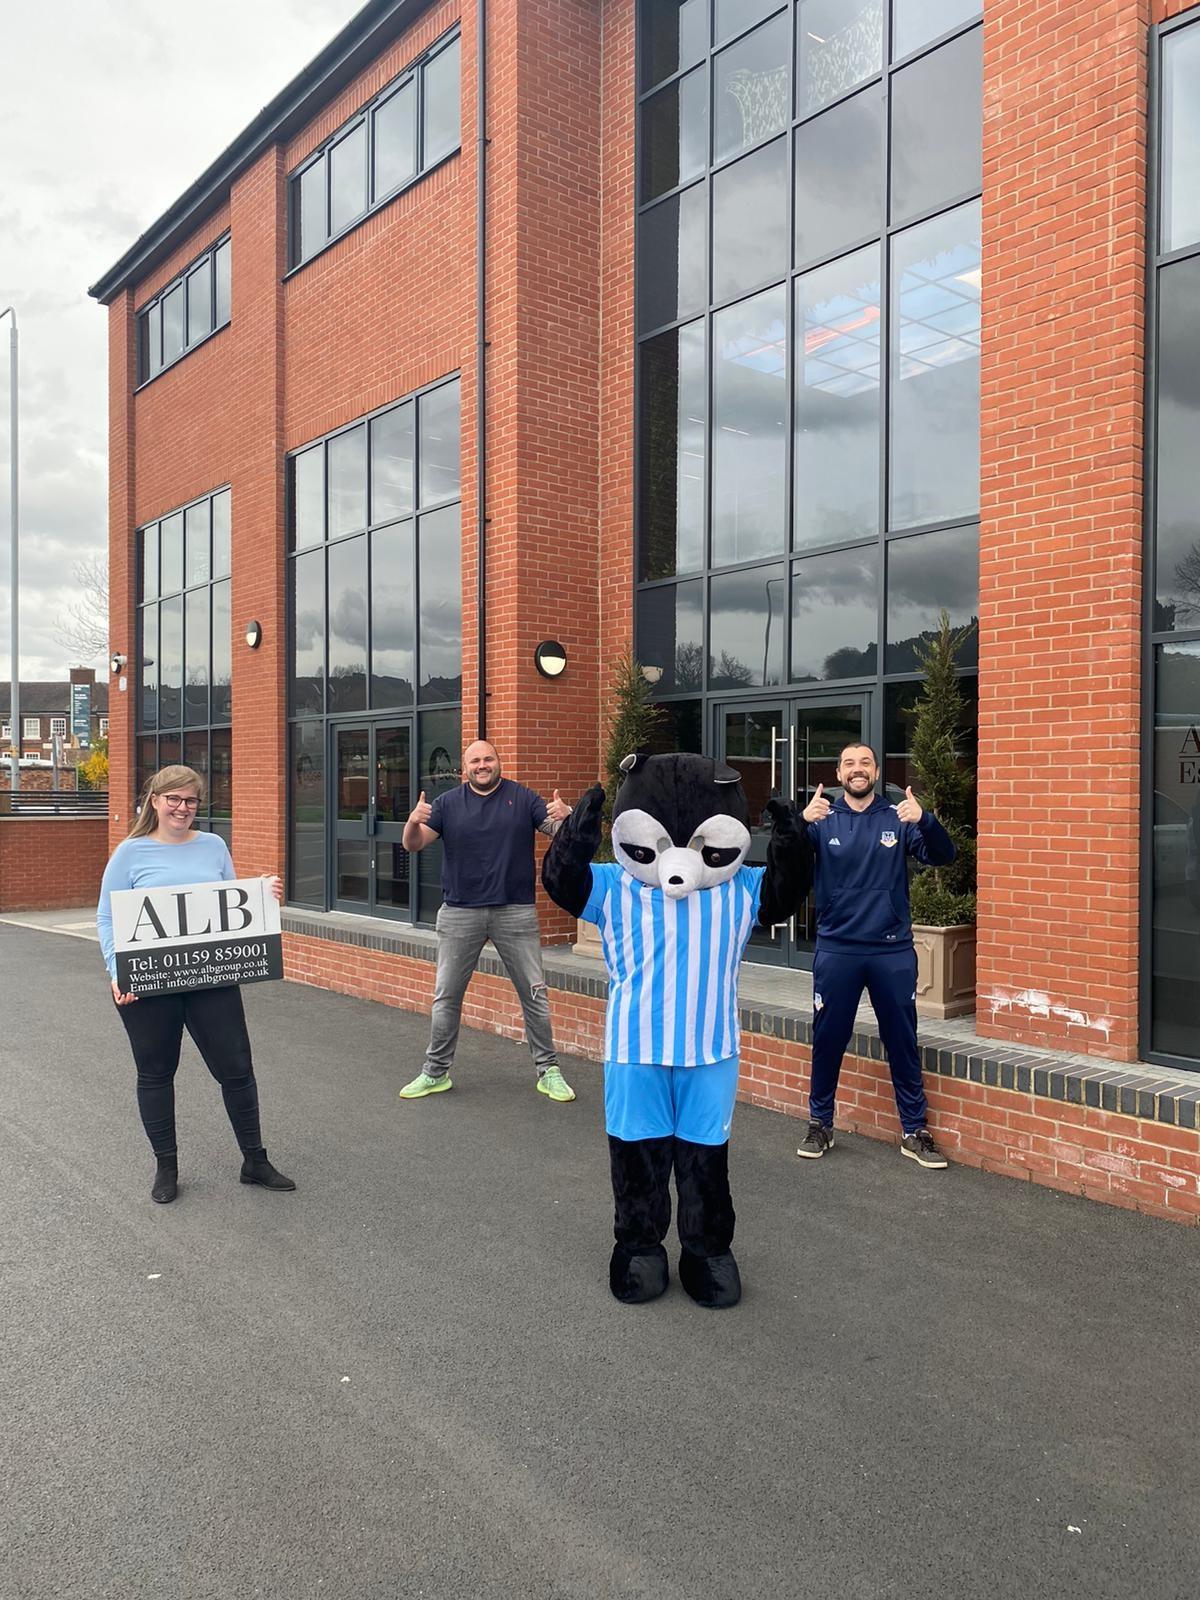 Notts Developer 'On Side' With Broxtowe United Sponsorship Deal